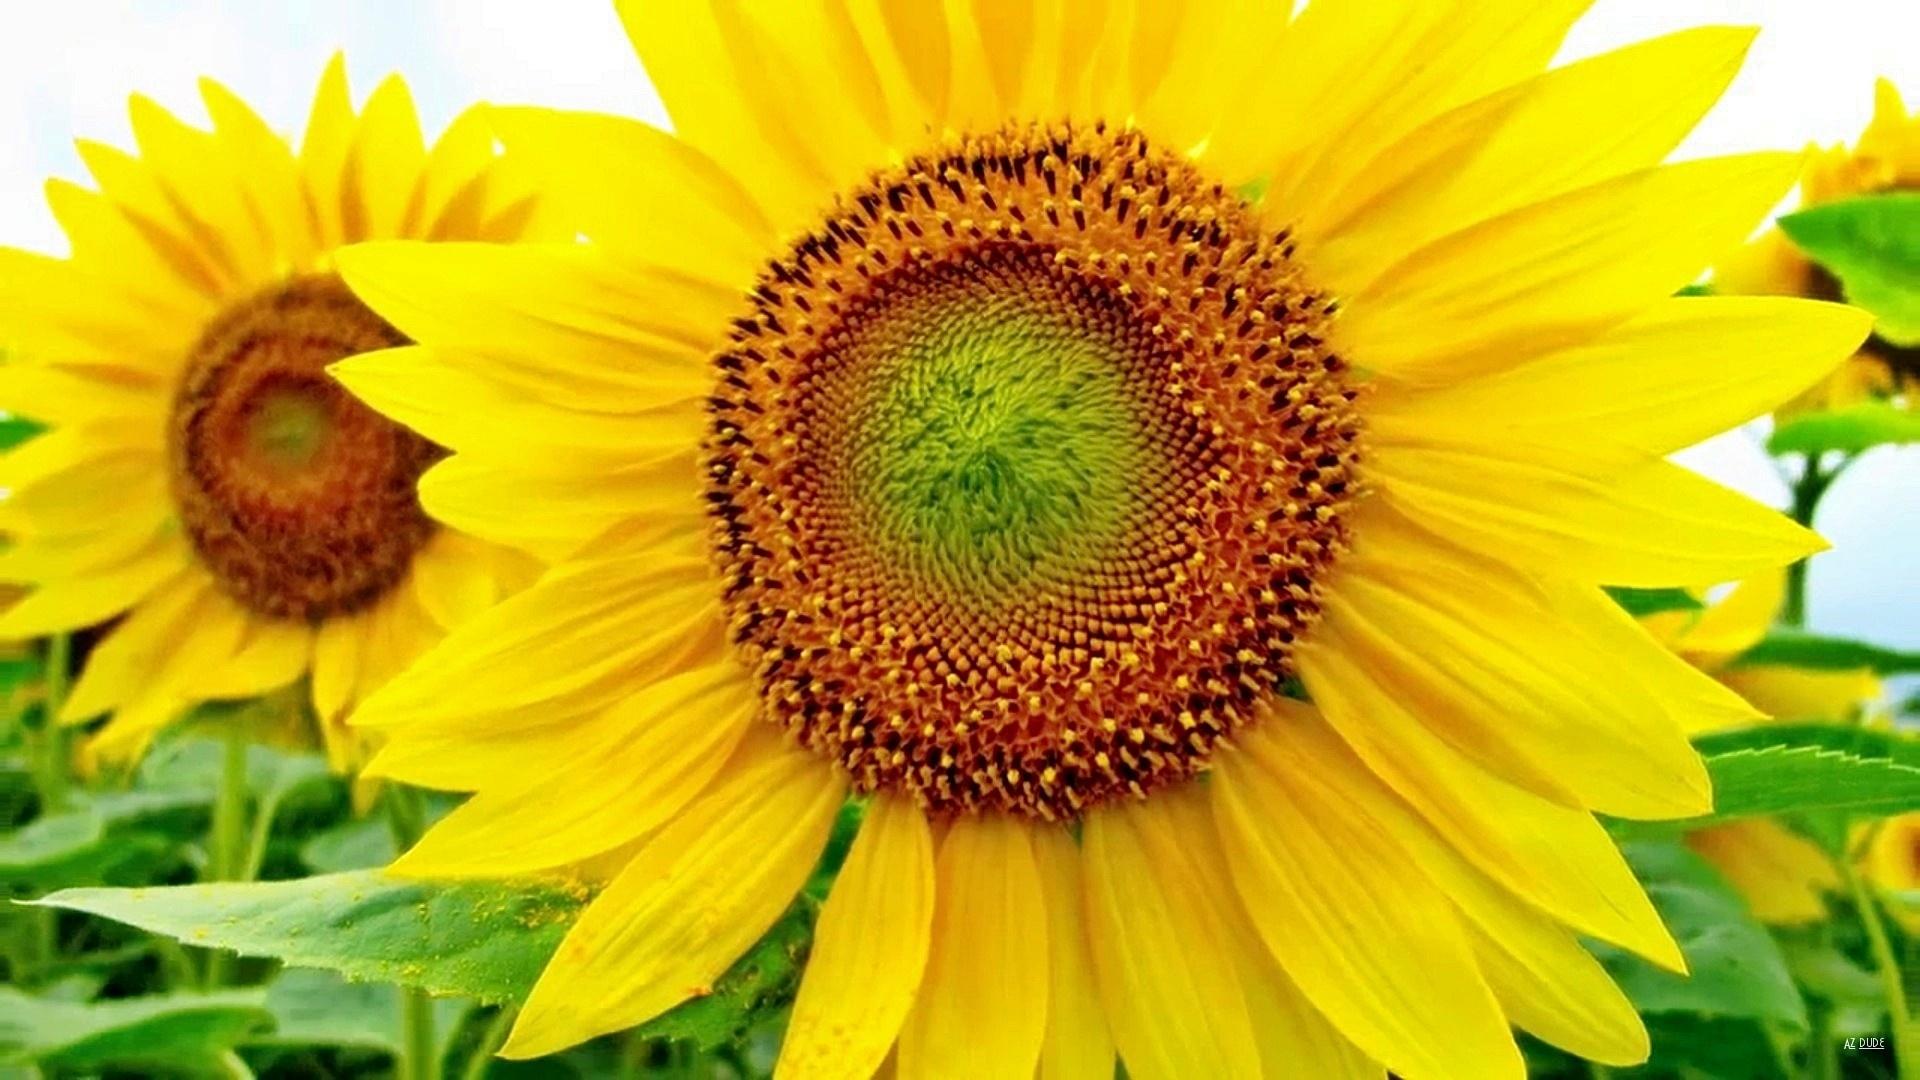 Sunflower HD Wallpaper | Background Image | 1920x1080 | ID ...